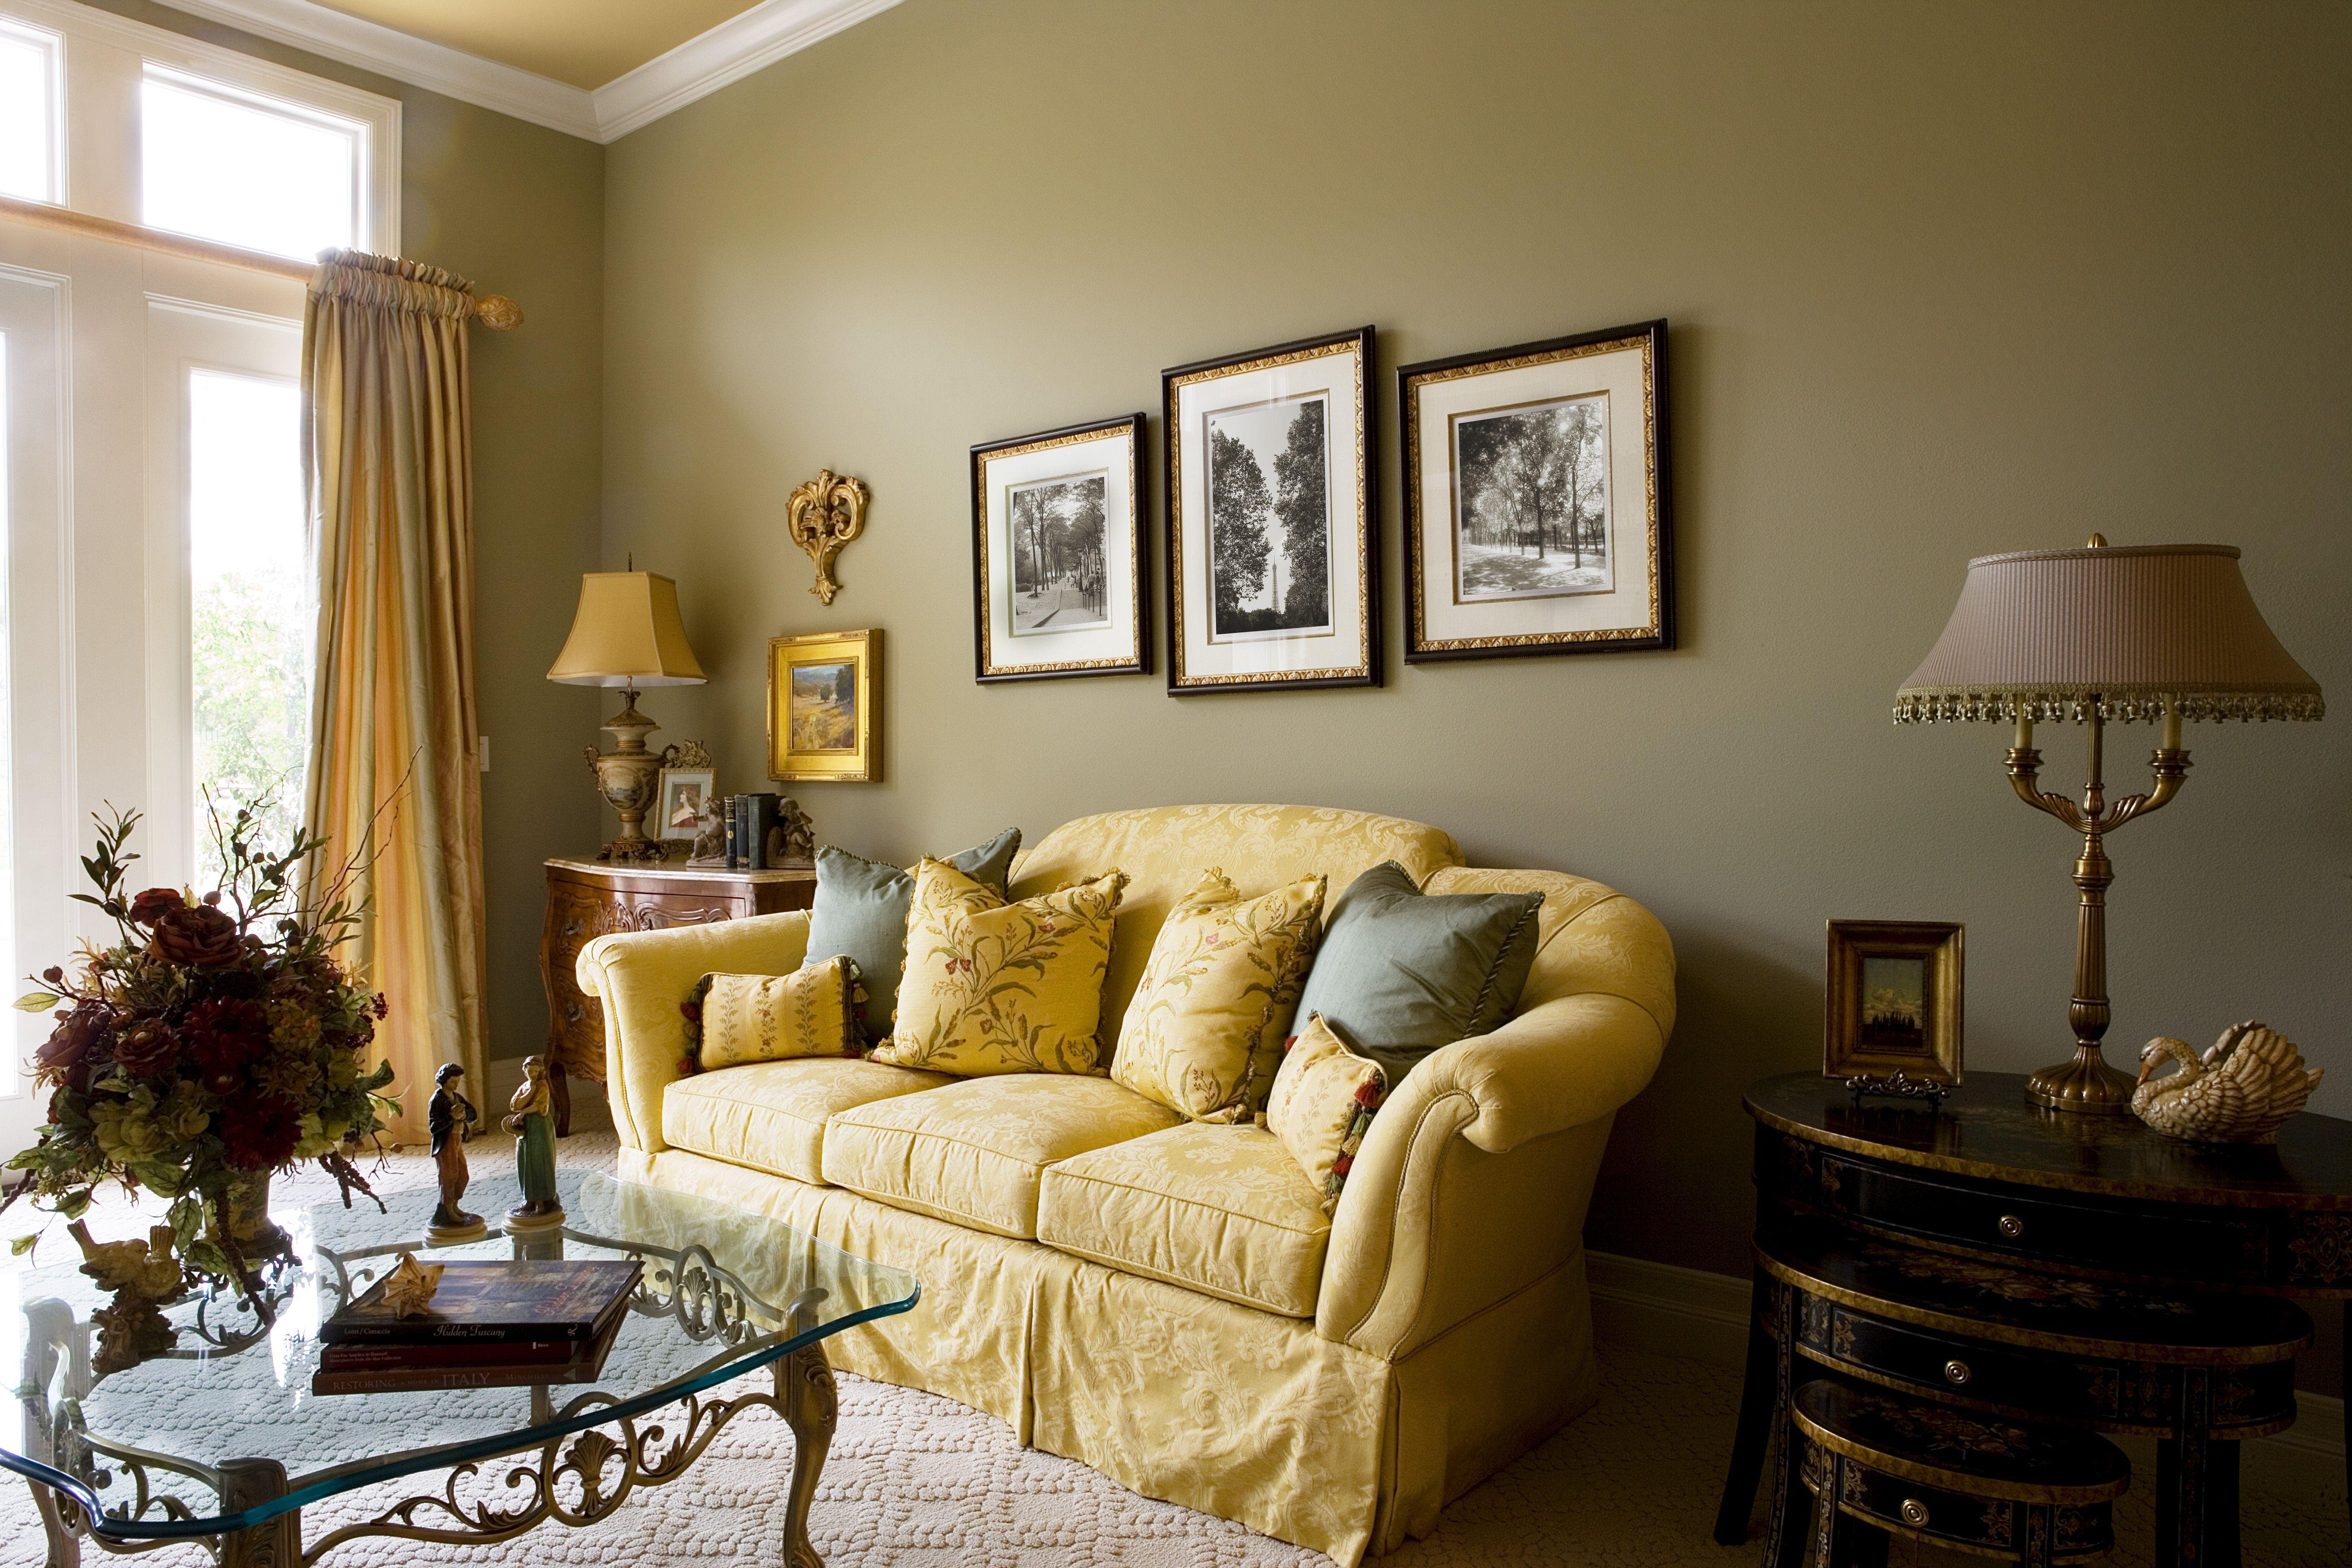 Sala de estar con sofá amarillo